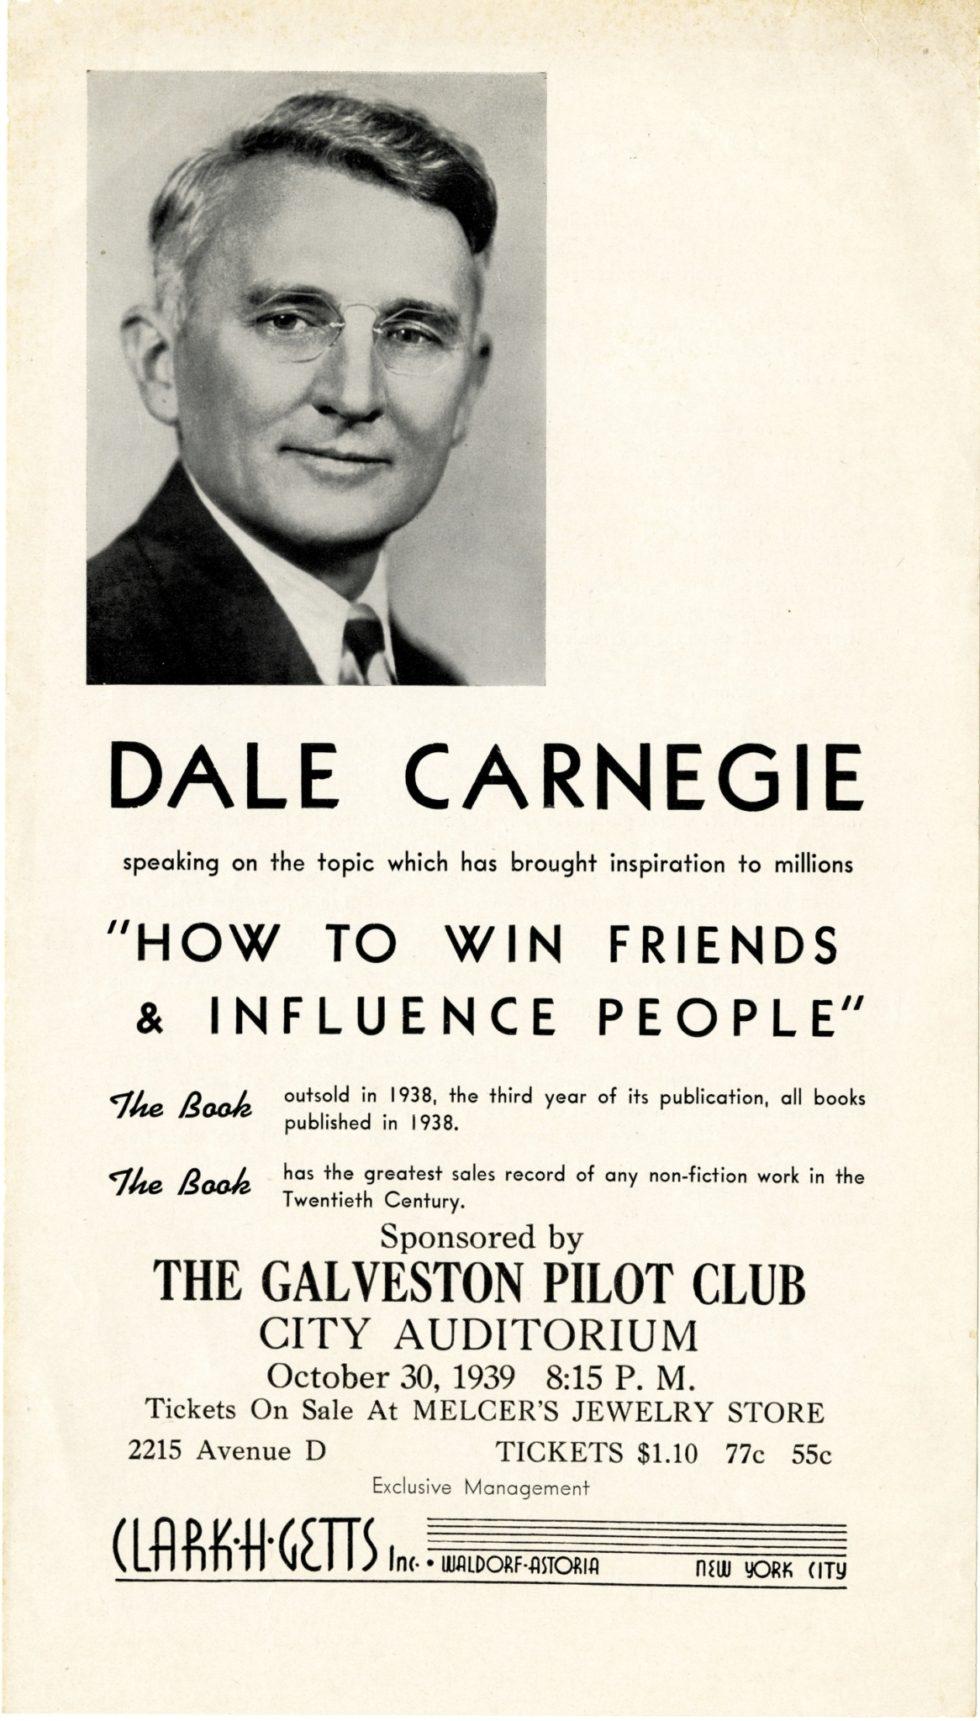 Dale Carnegie's Visit to Galveston